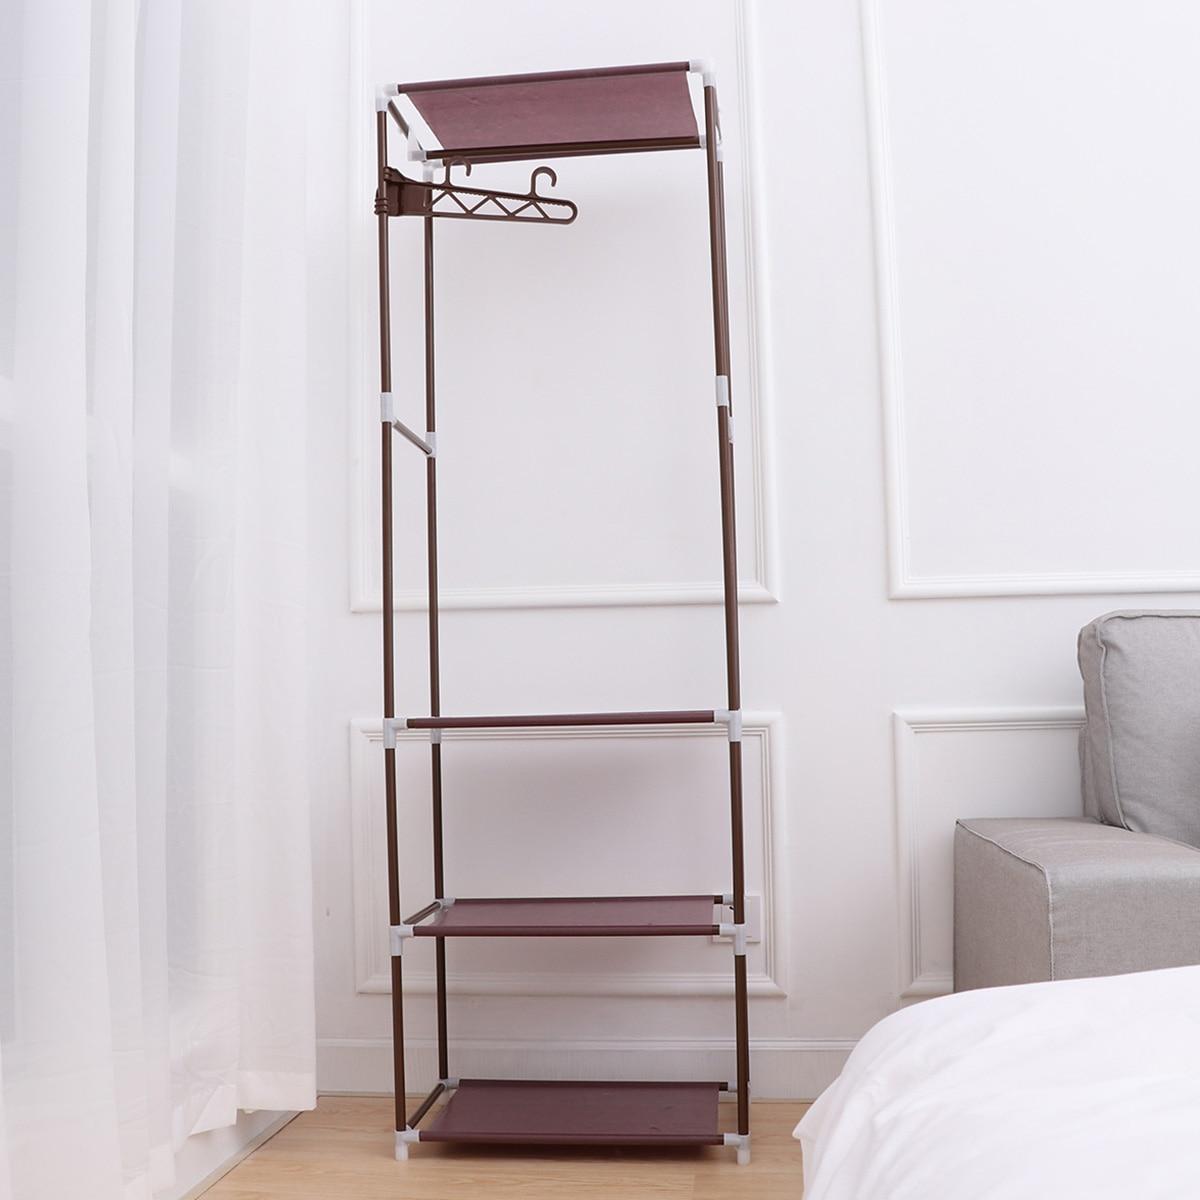 US $25.13 47% OFF|1pcs Portable Clothes Rack Clothing Floor standing Shelf  Garment Organizer Bedroom Coat Rack Storage Stand-in Storage Holders & ...